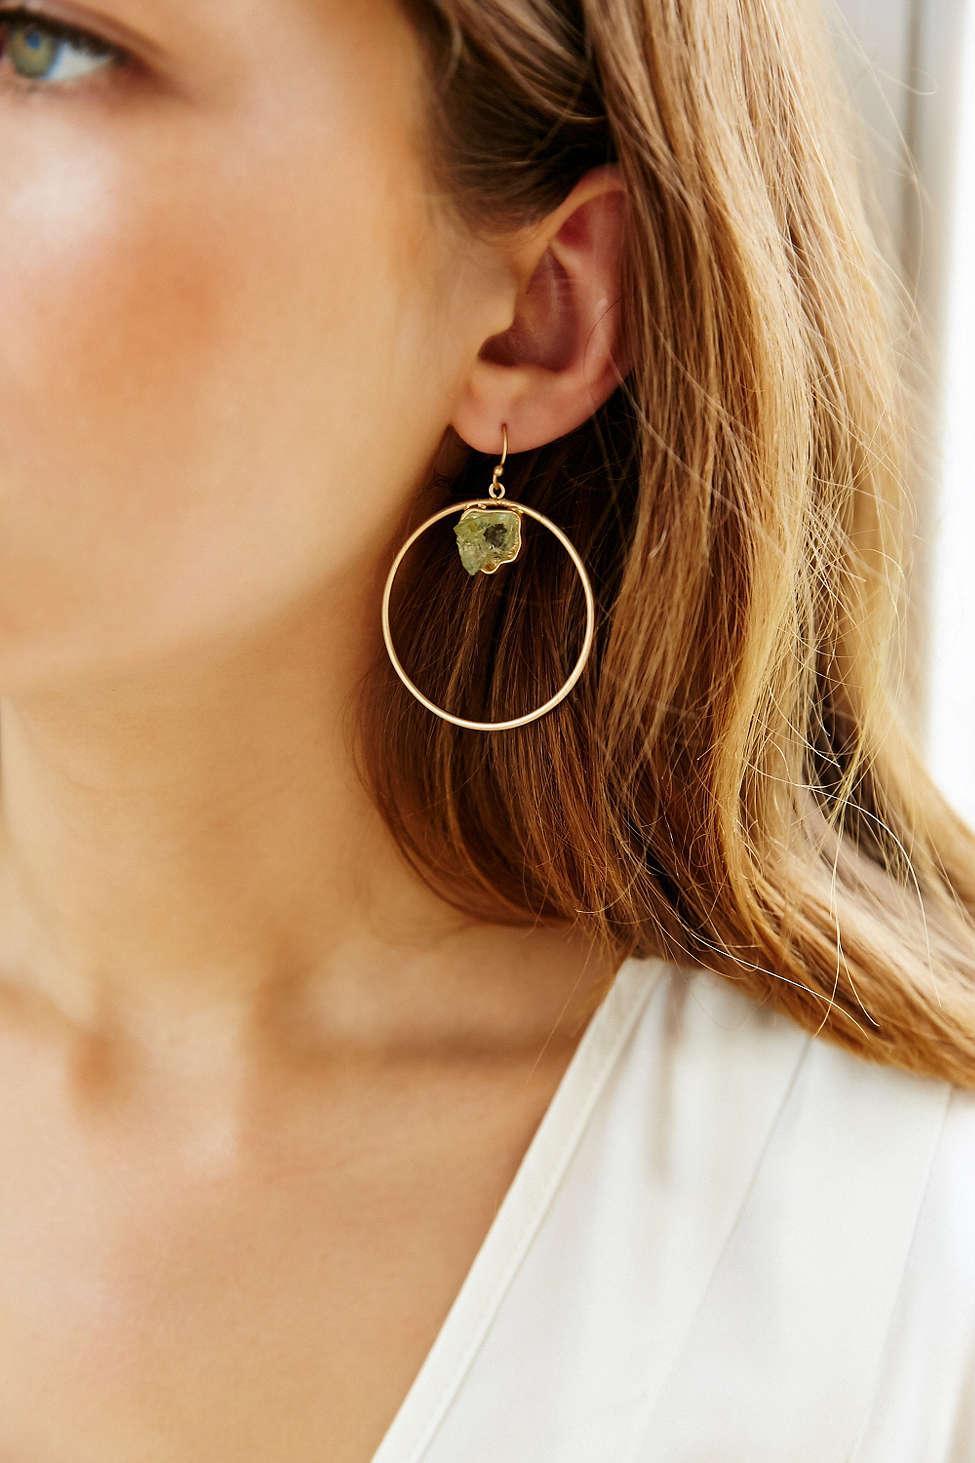 Roman Bath Crystal Hoop Earring (Urban Outfitters)